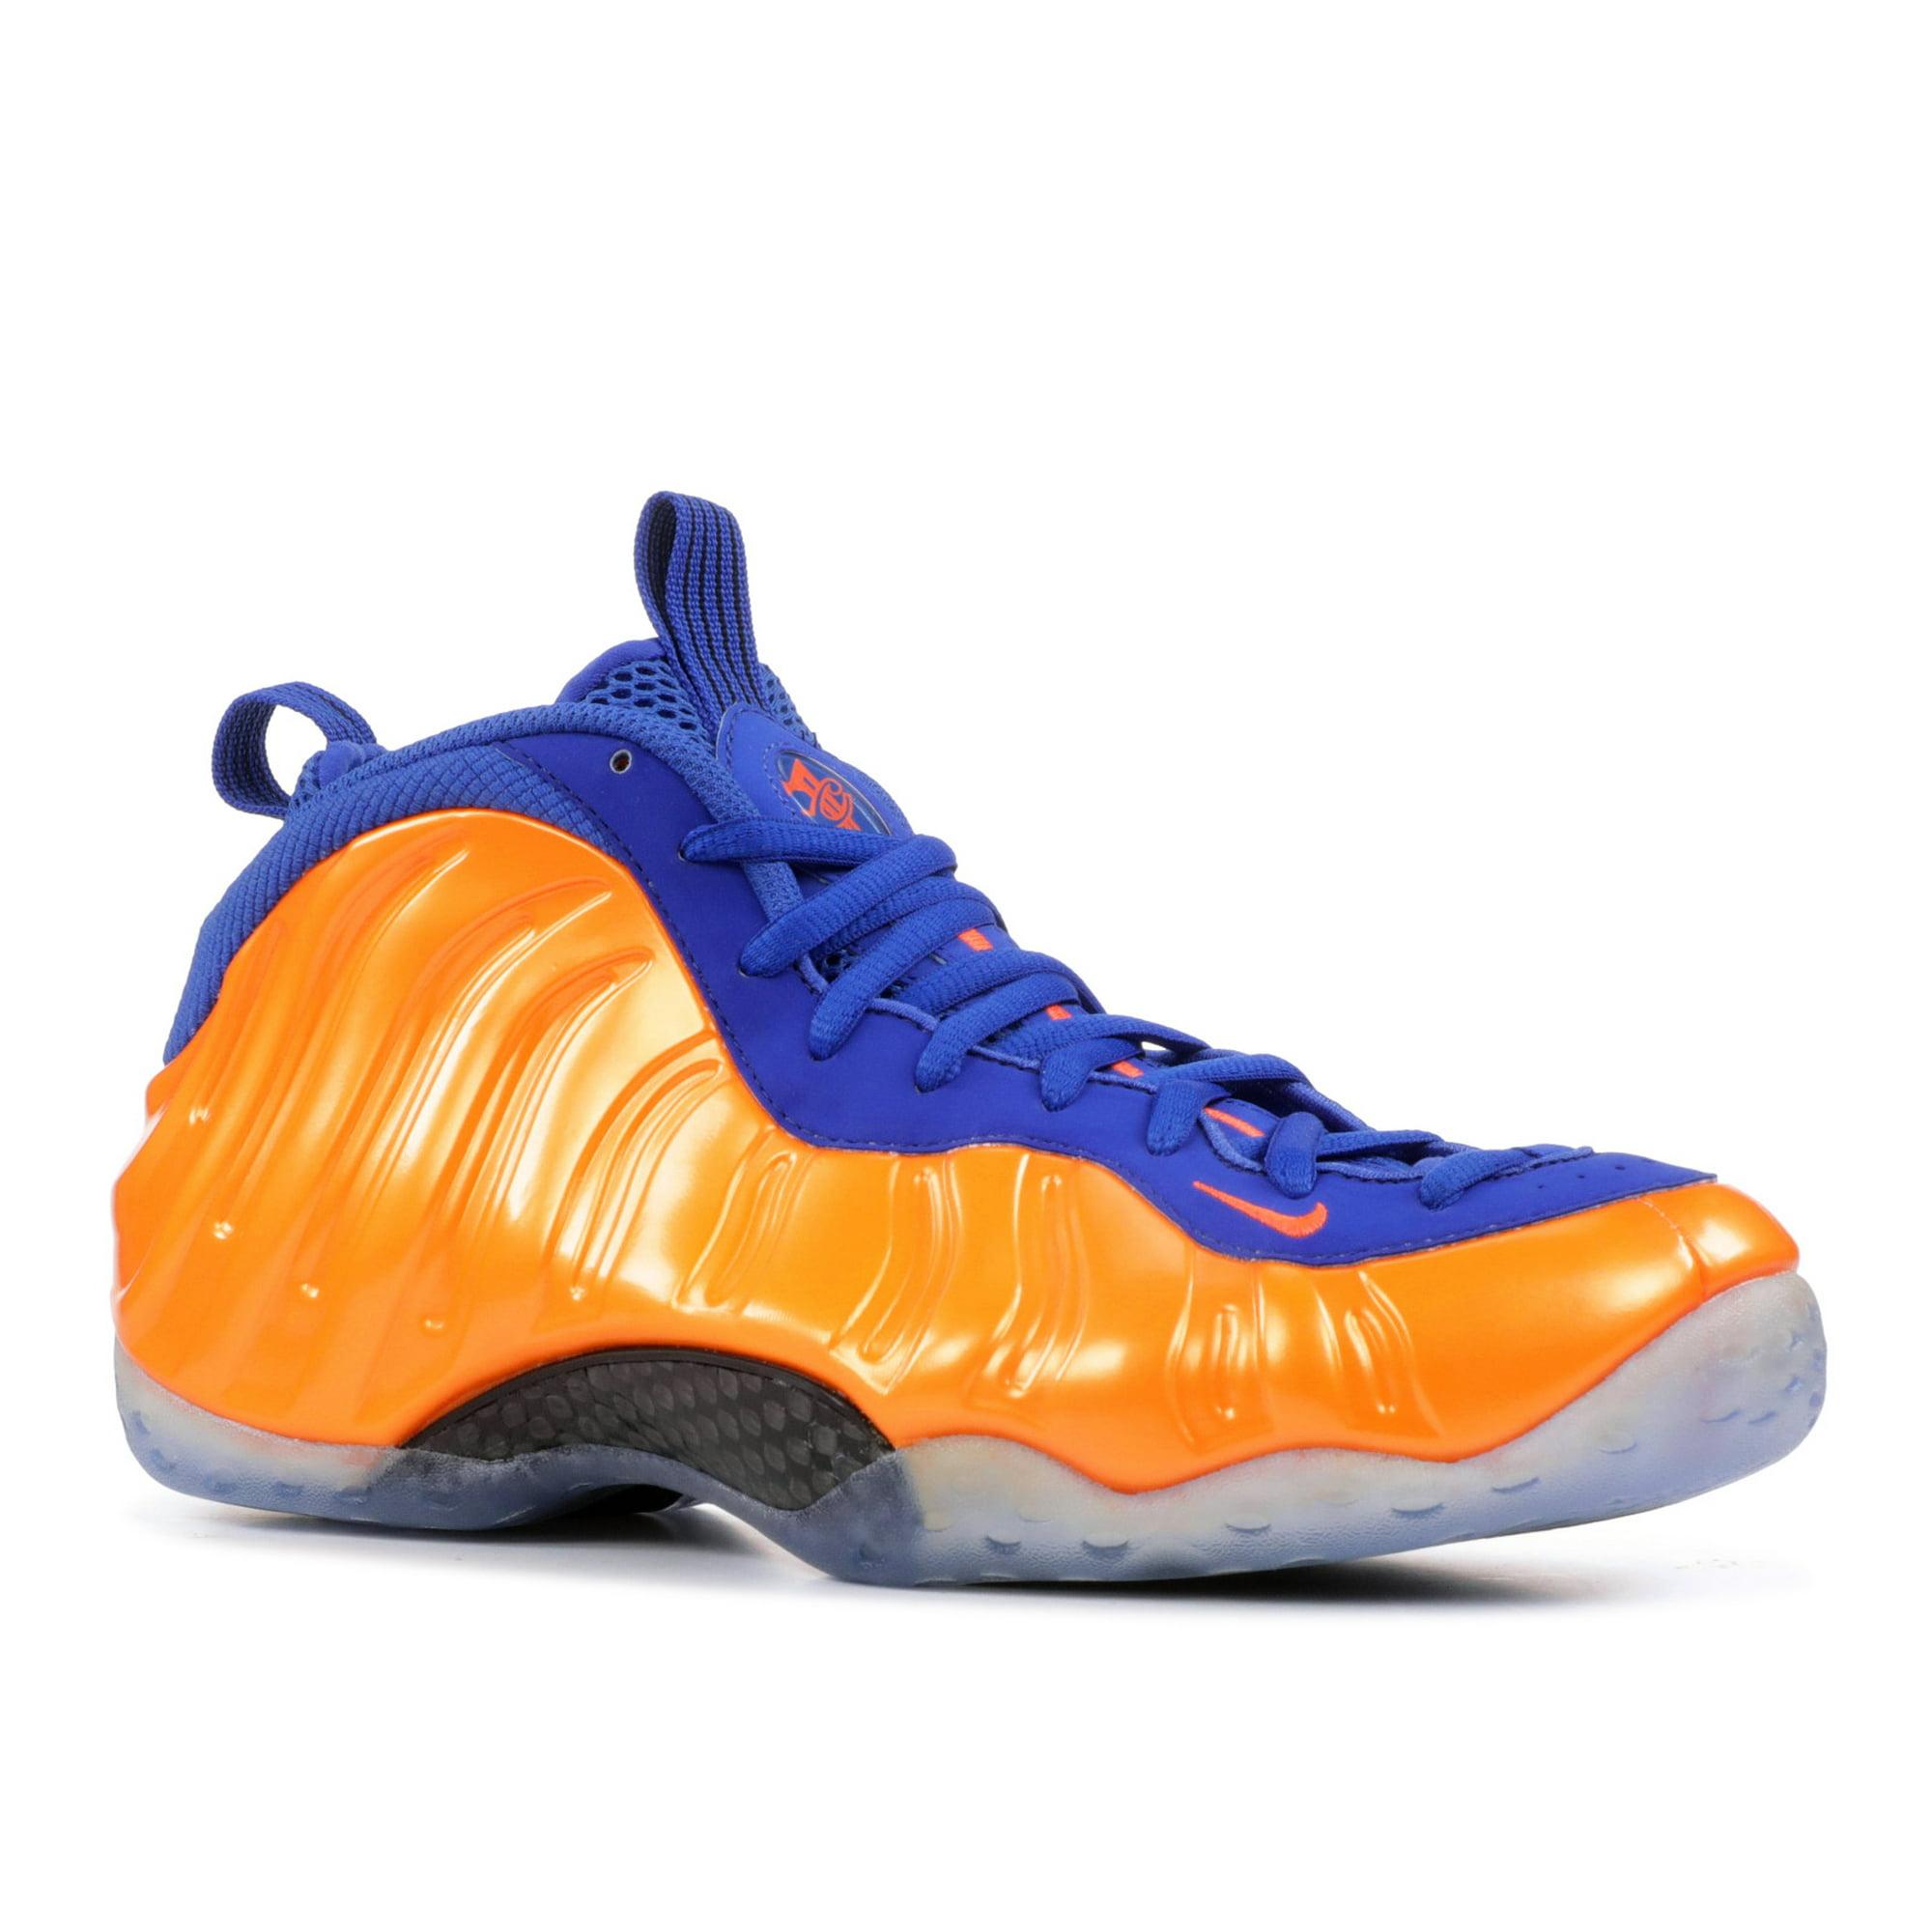 finest selection edd1a 6dac3 Nike - Men - Air Foamposite One  Knicks  - 314996-801 - Size 9.5   Walmart  Canada